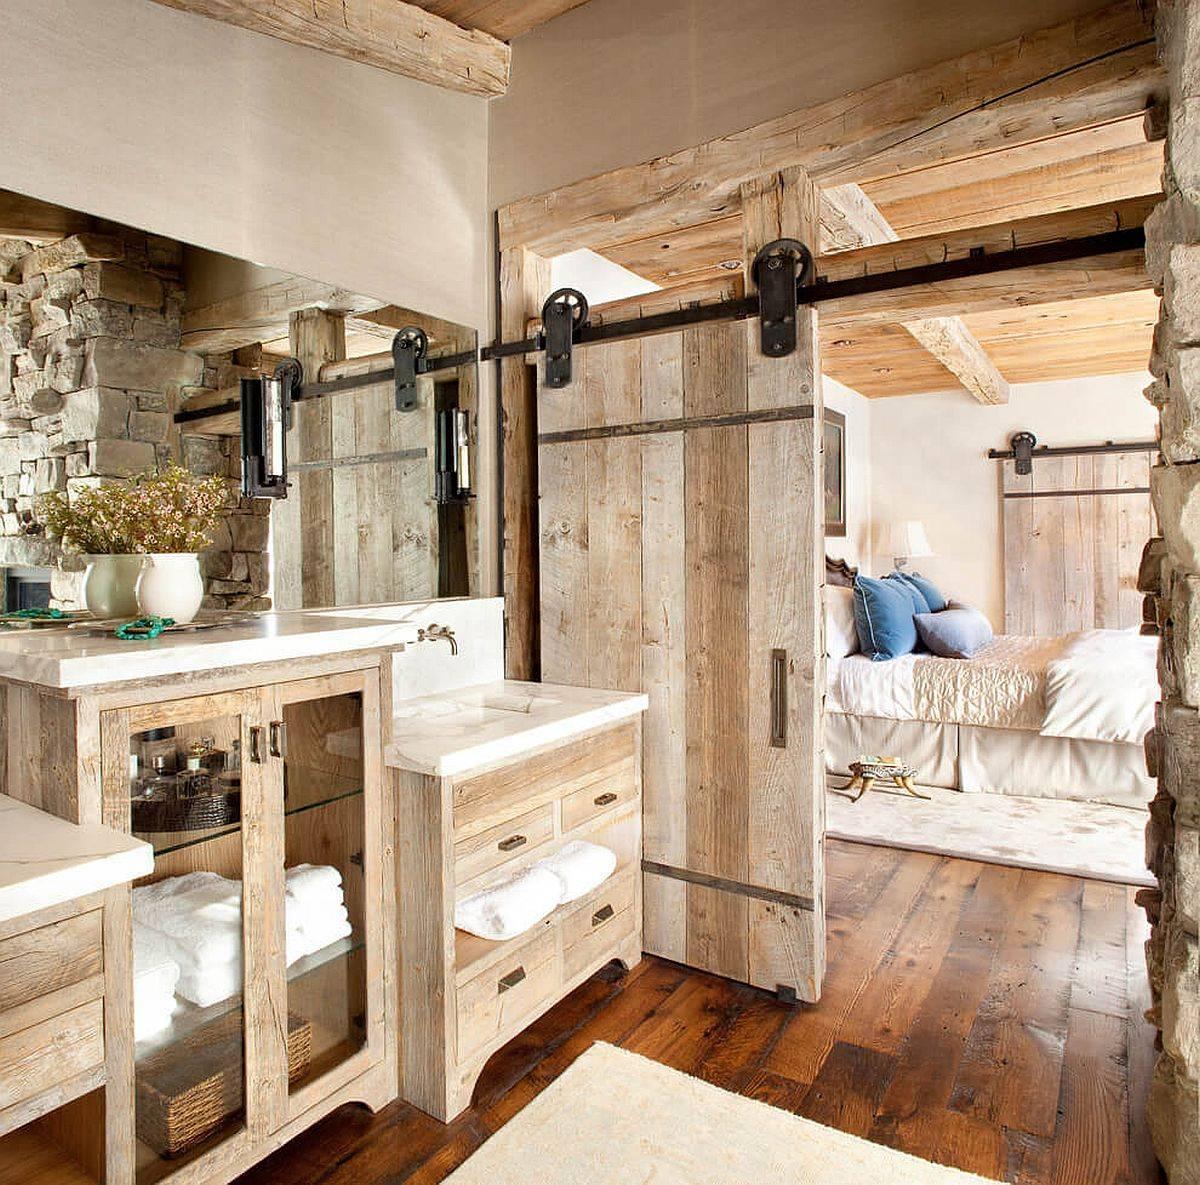 Woodsy-farmhouse-bathroom-with-sliding-barn-door-feels-like-a-continuation-of-the-bedroom-30471